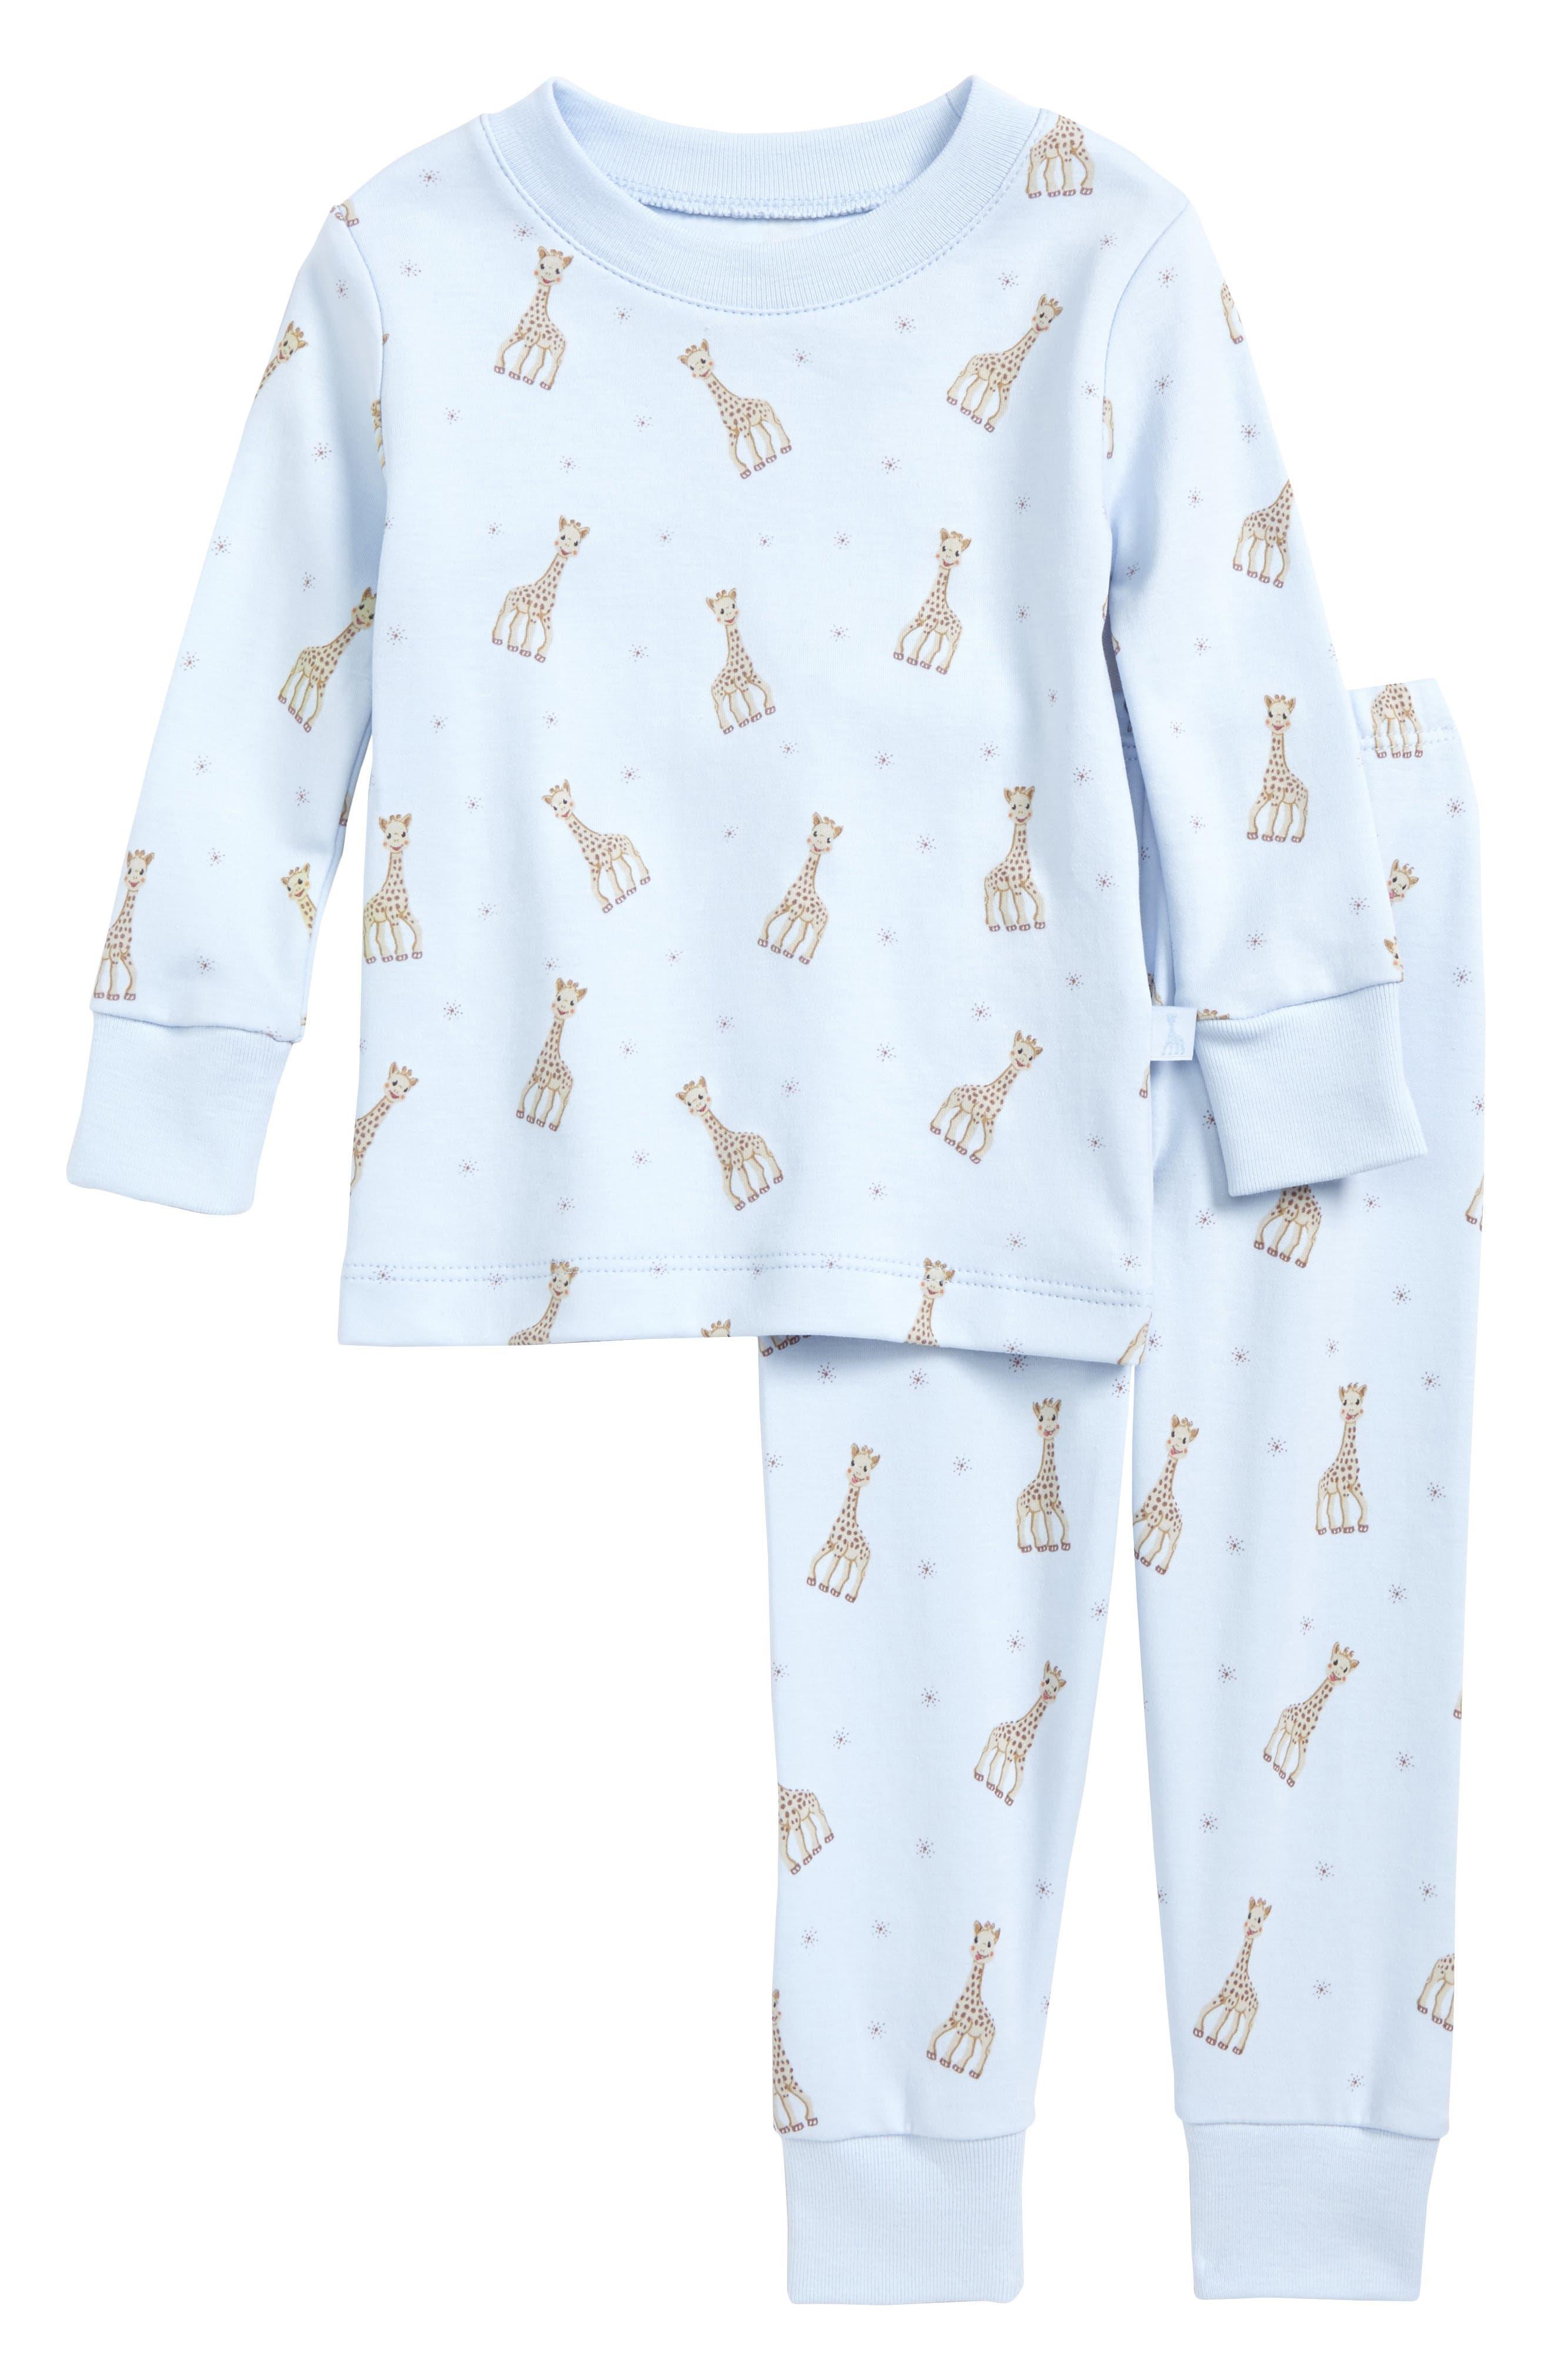 Main Image - Kissy Kissy Sophie la Girafe Fitted Two-Piece Pajamas (Baby Boys)